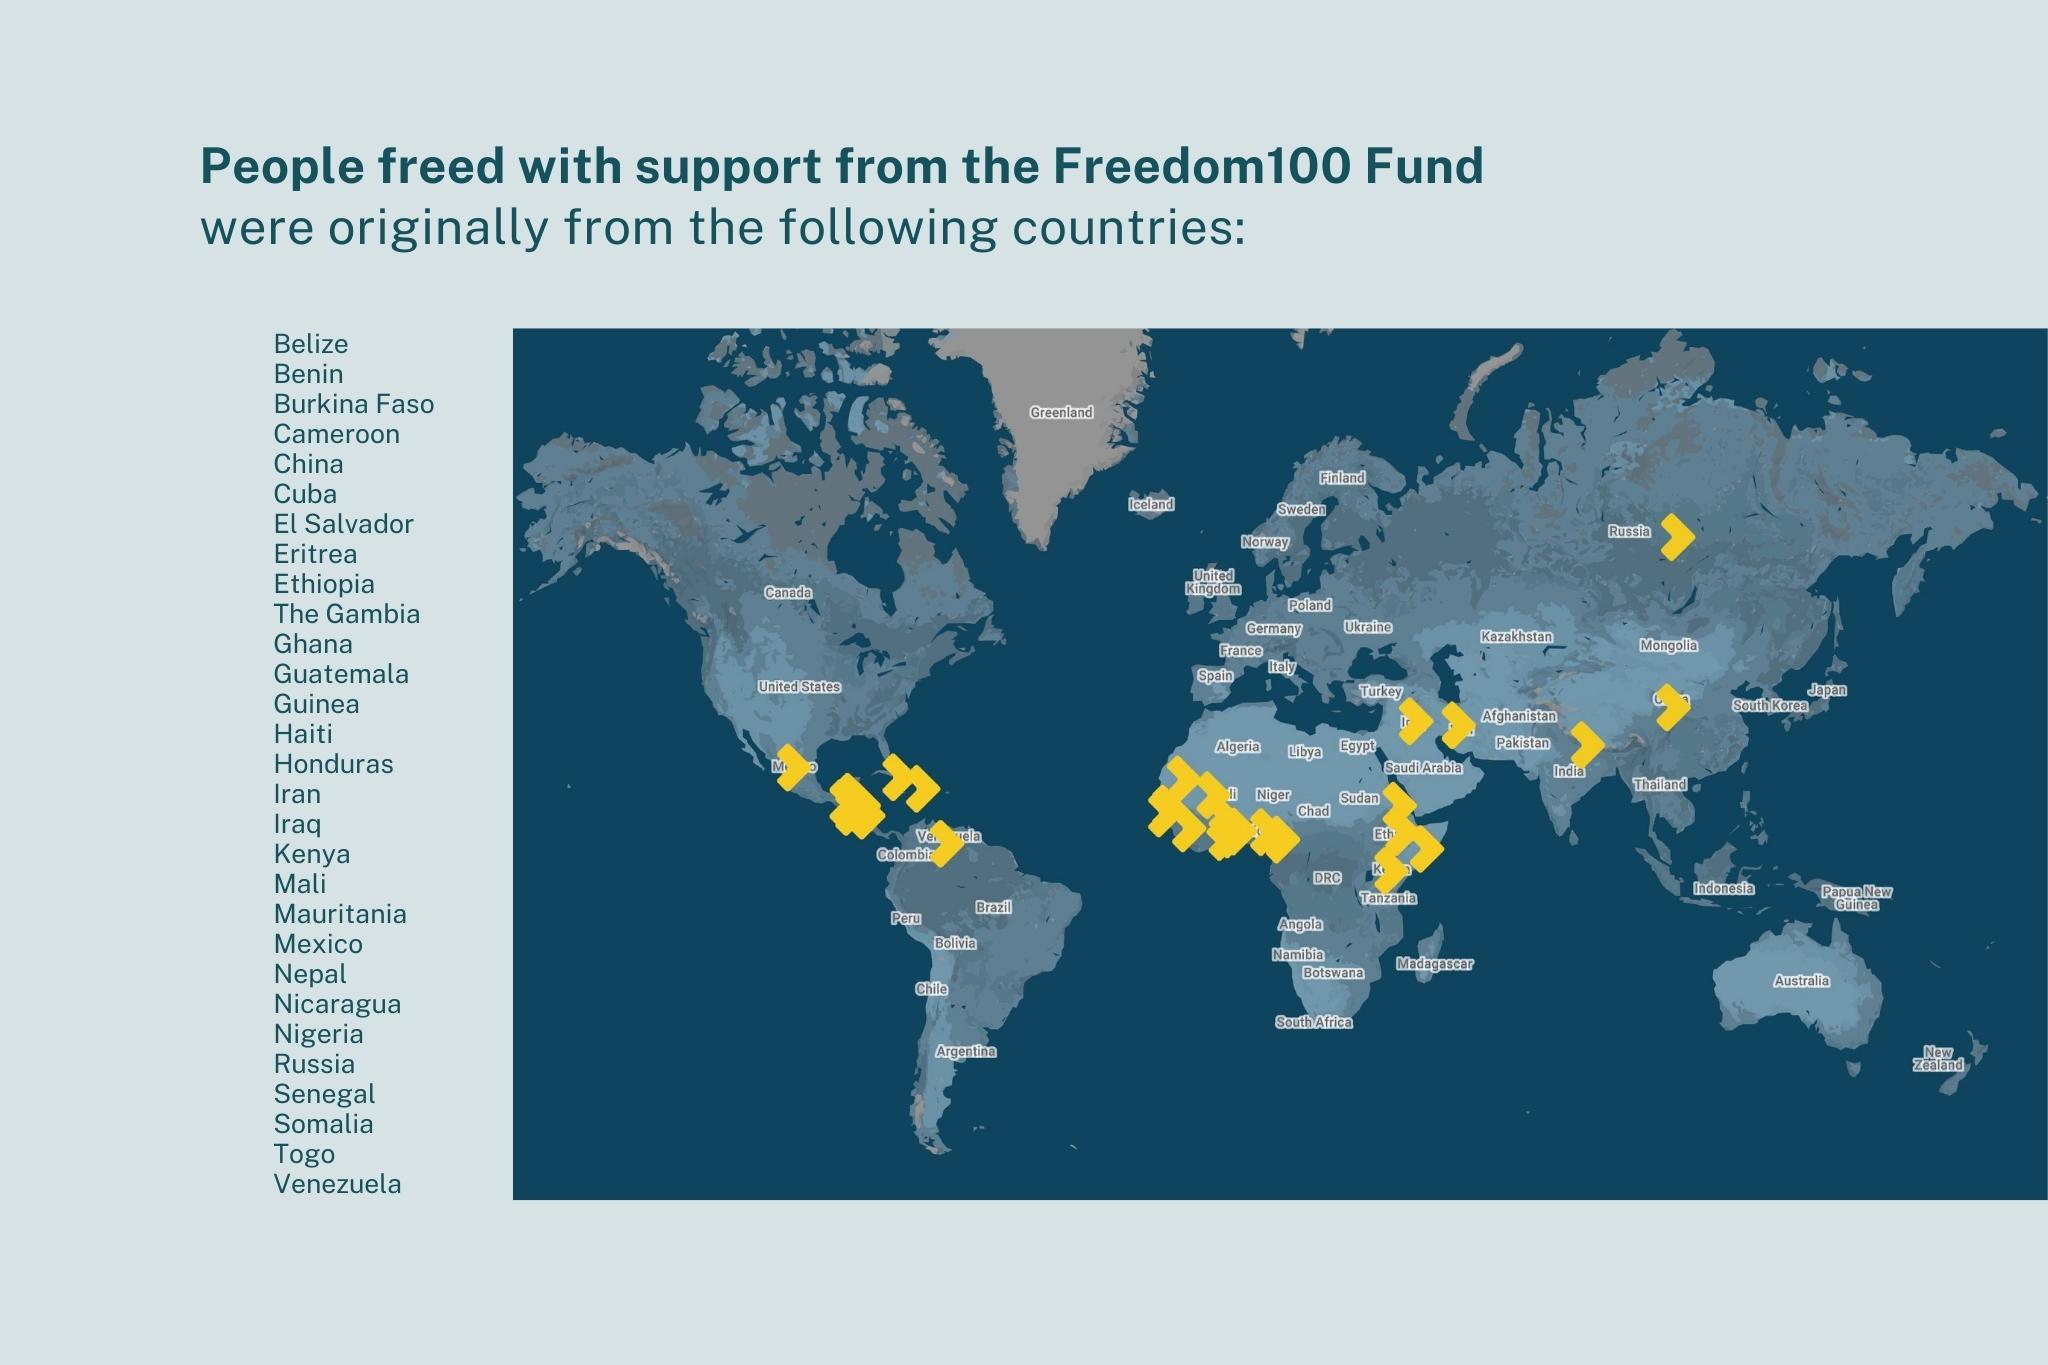 Freedom100 Fund countries of origin